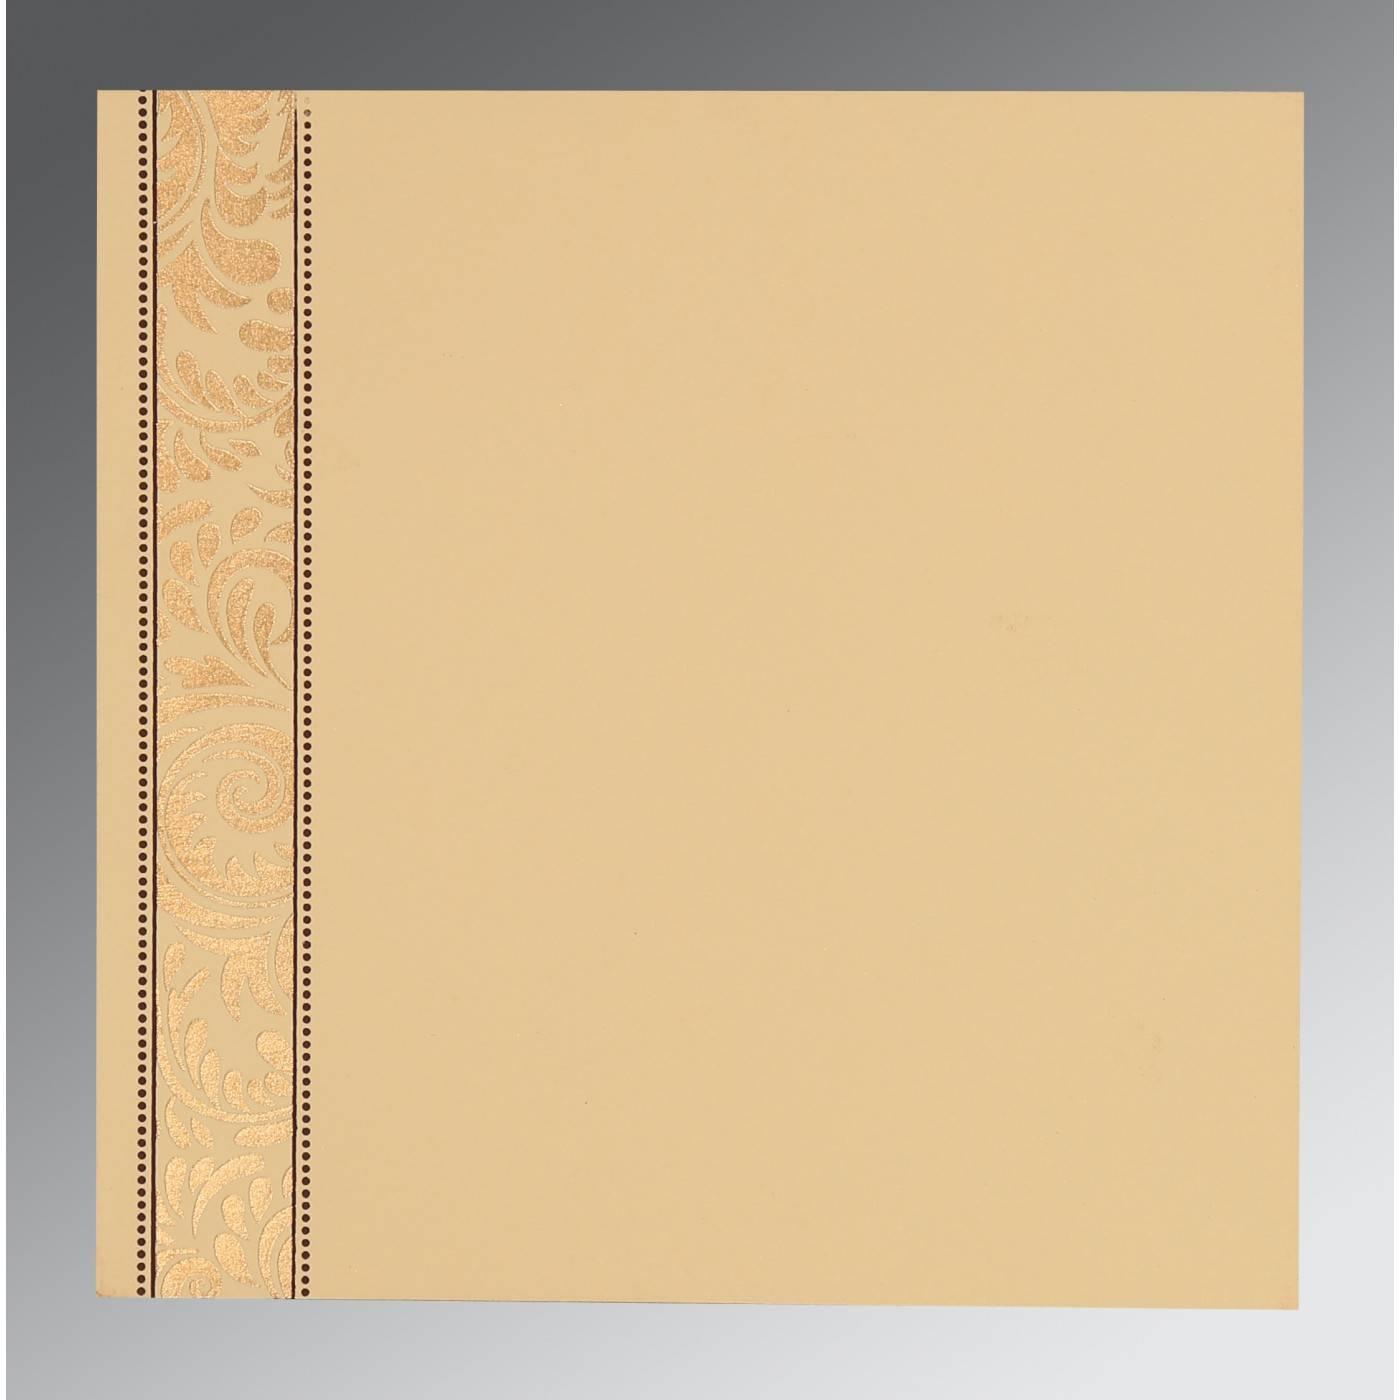 DARK BROWN SHIMMERY FLORAL THEMED - SCREEN PRINTED WEDDING CARD : CSO-8235K - IndianWeddingCards